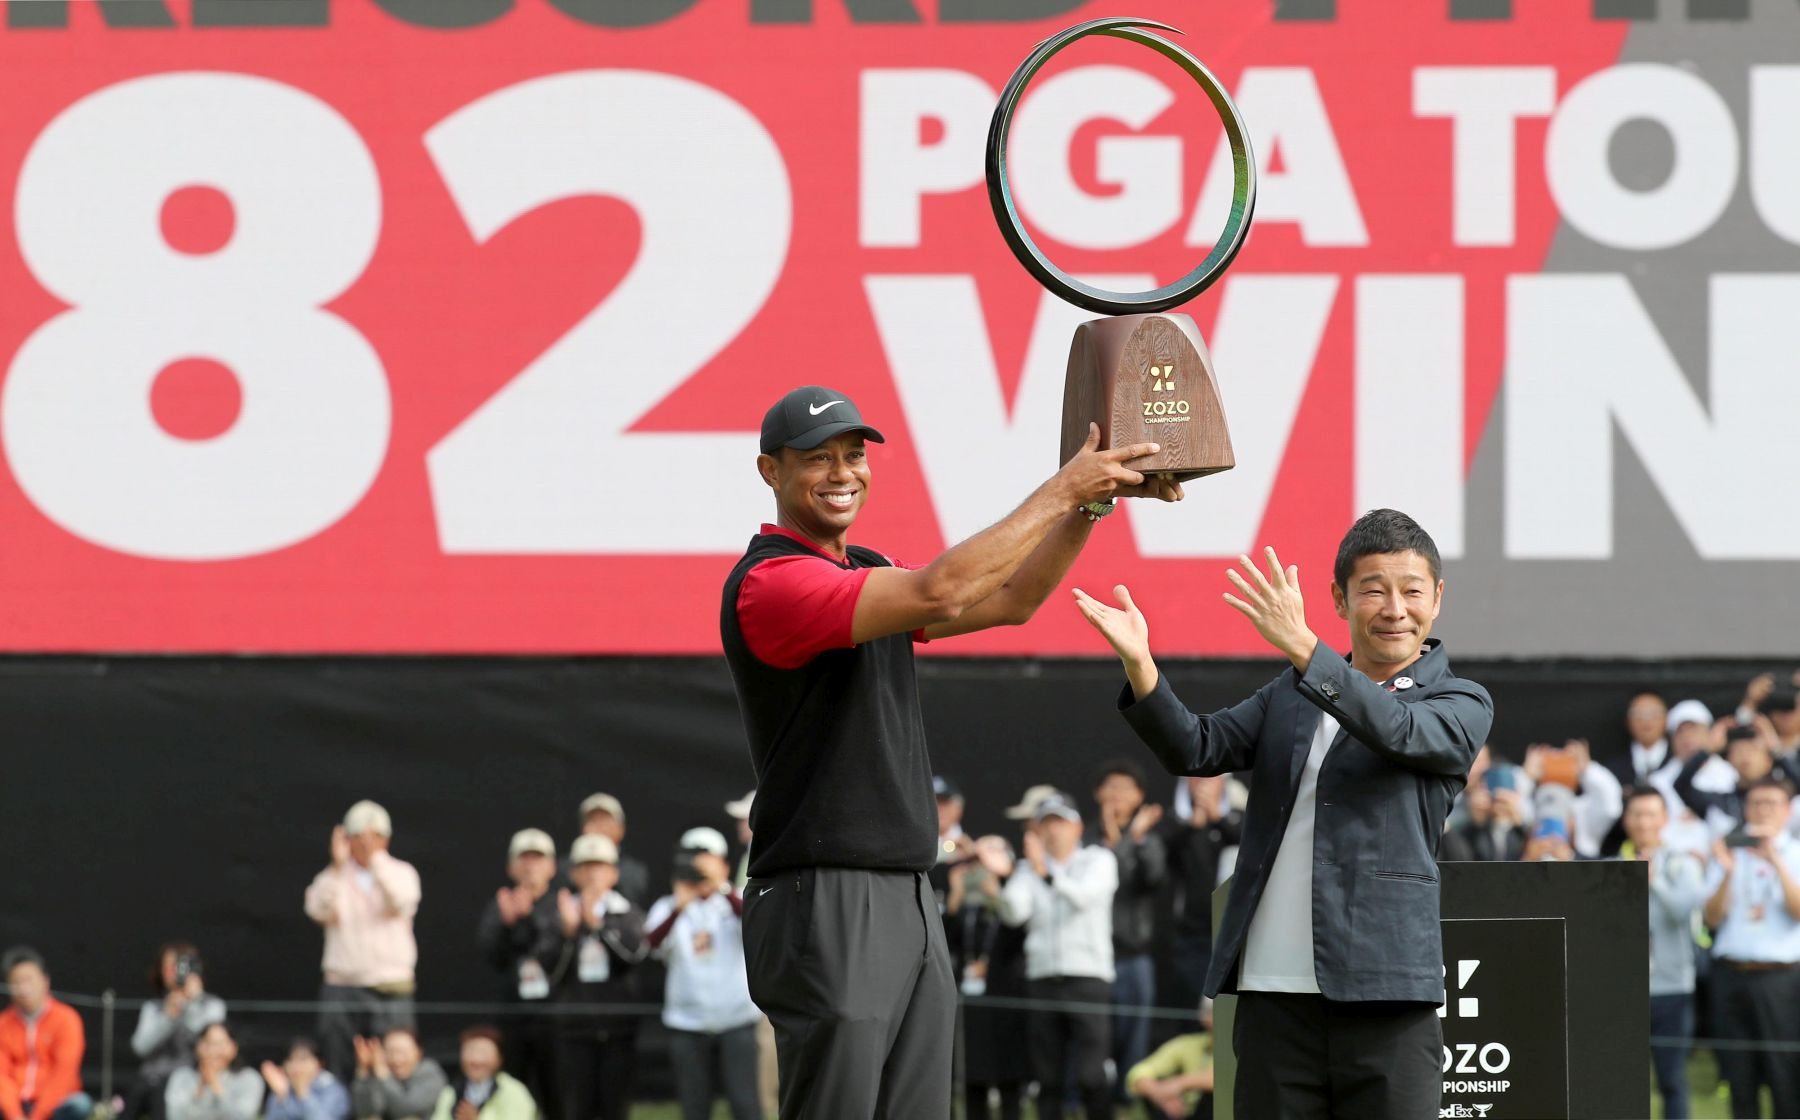 Tiger Woods 82 PGA Tour Win in Japan 003